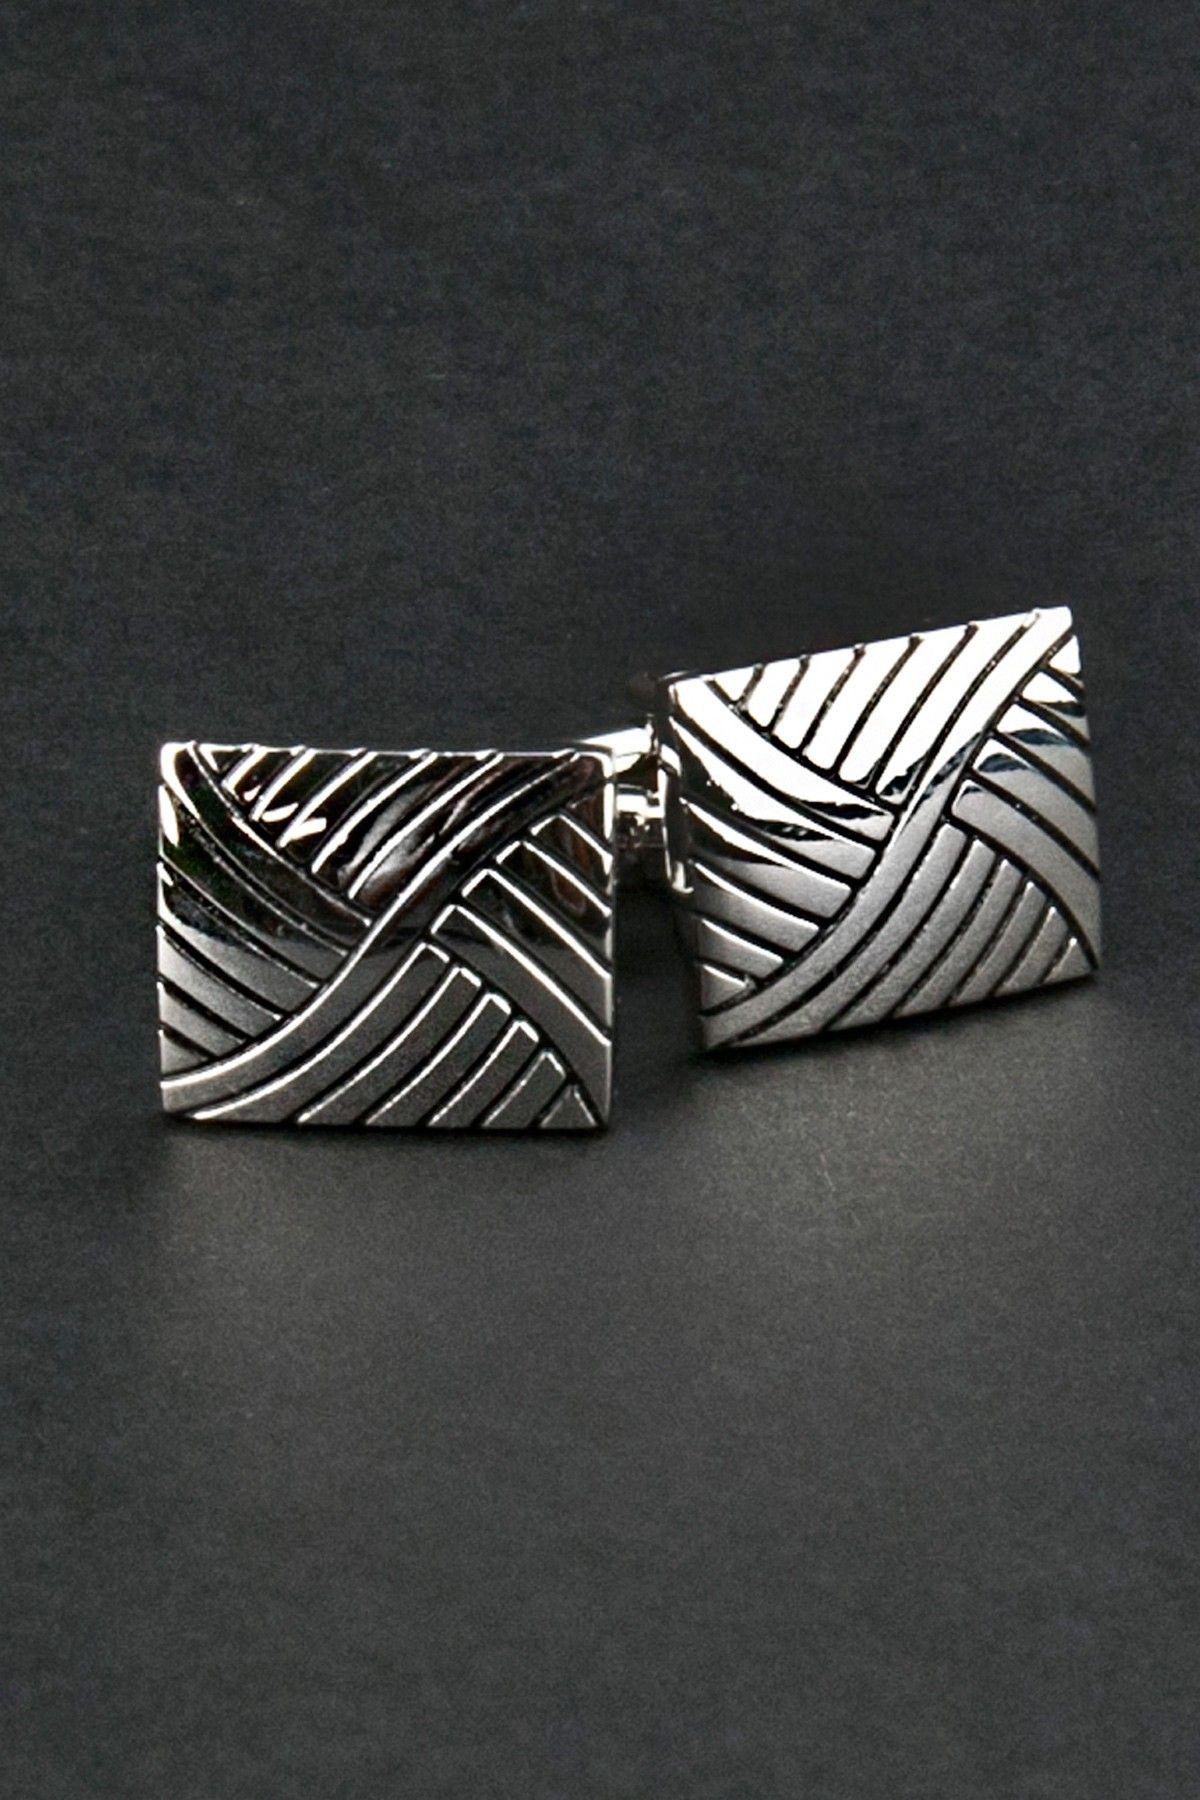 Weave Cufflink Set  CufflinkMen #Bags #Accessories